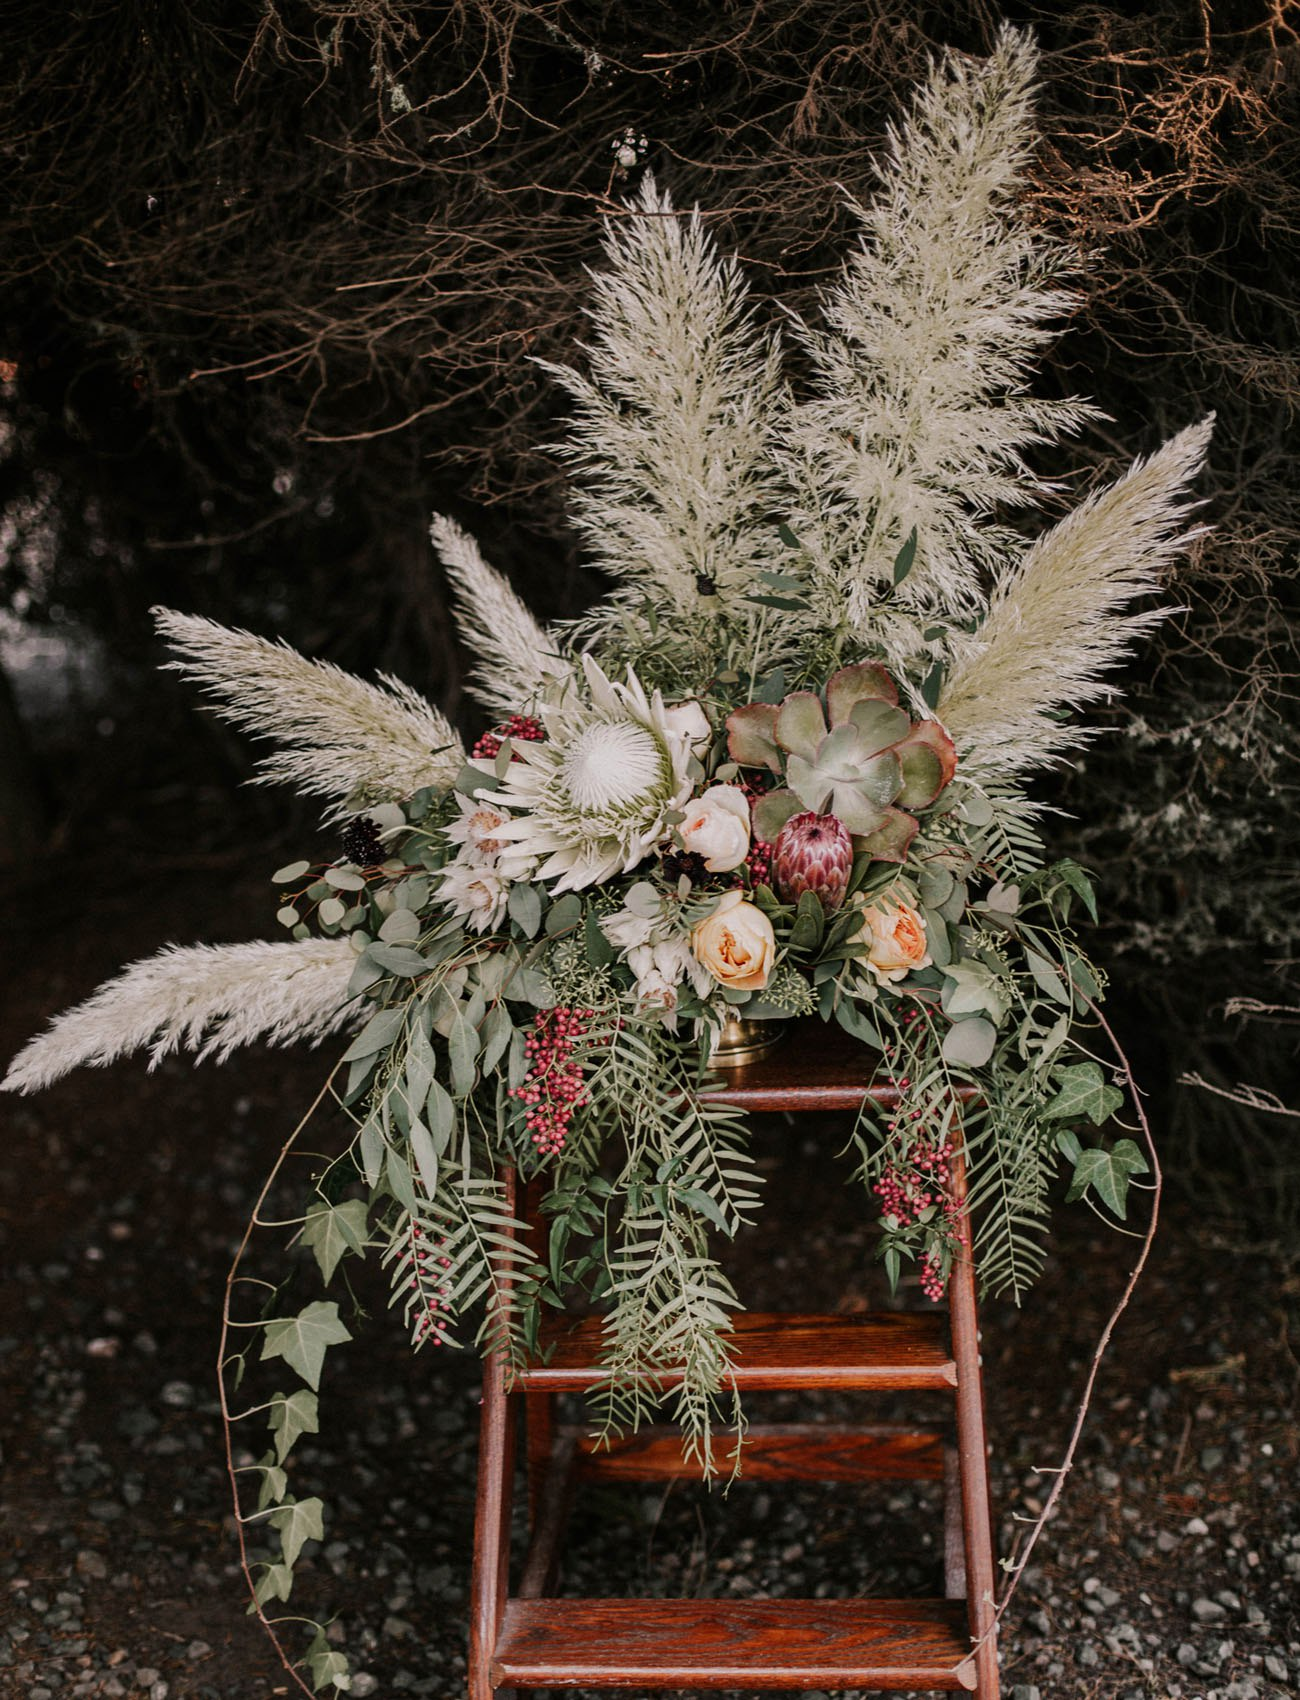 2OqbkAOQEp4 - Свадьба в заповедном лесу на берегу океана (26 фото)